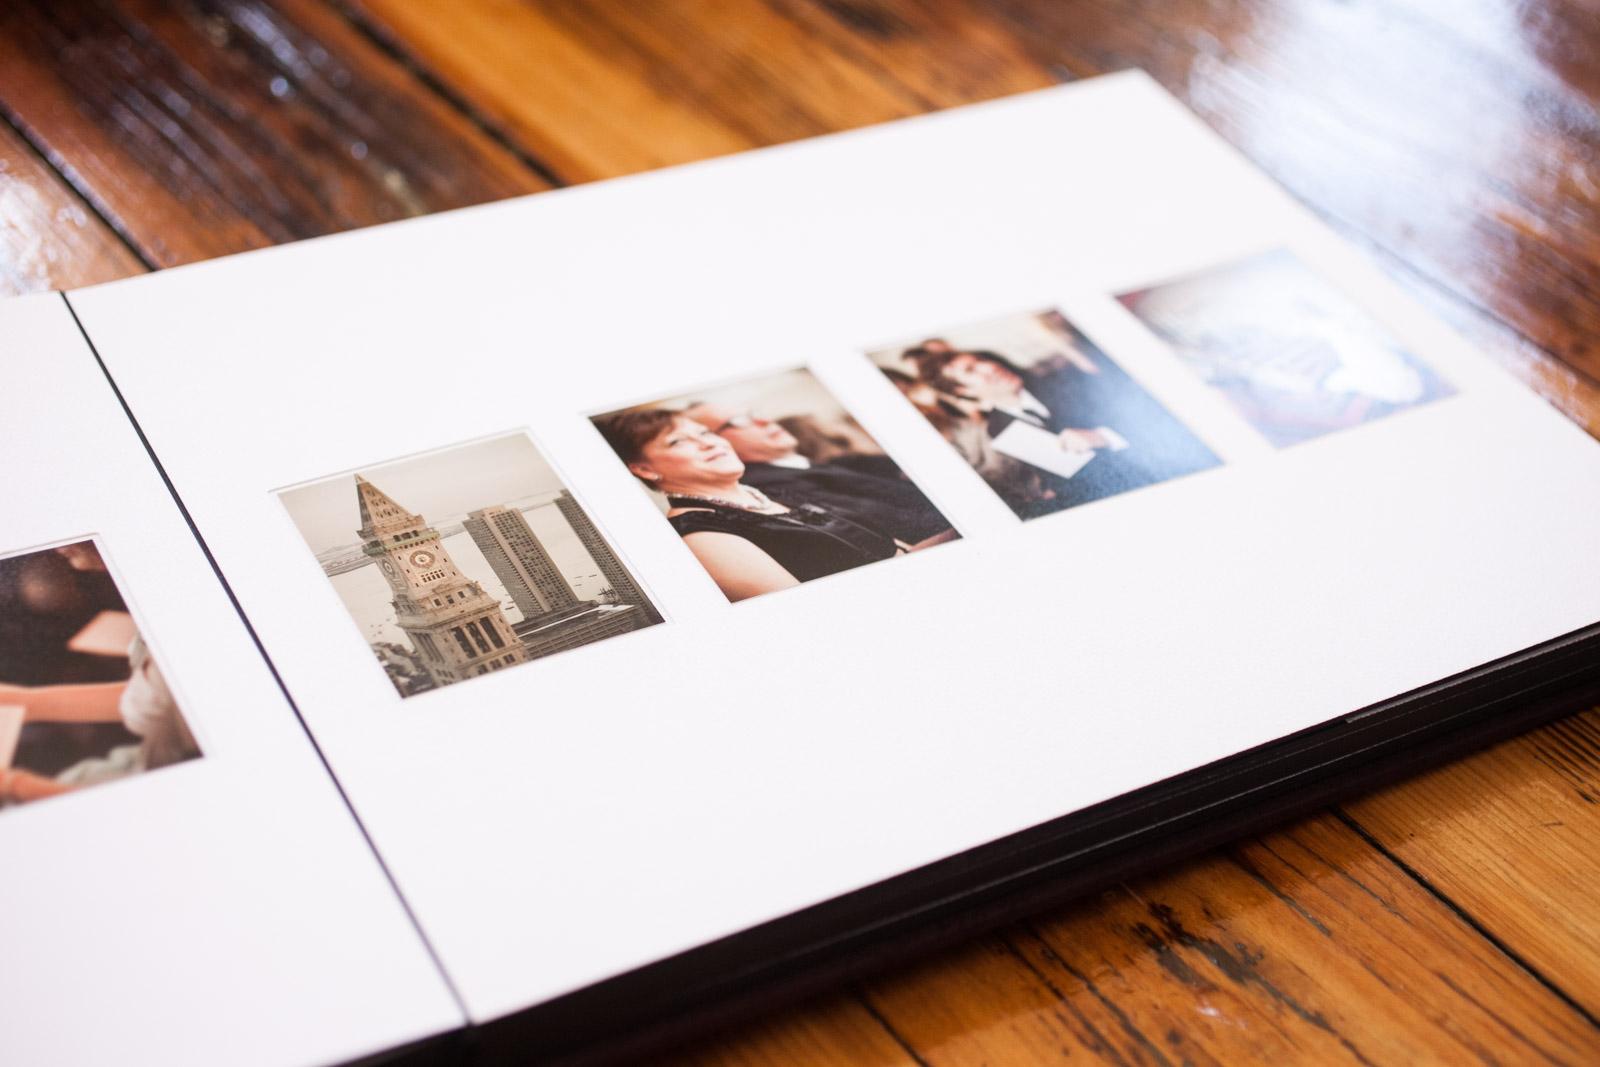 boston matte wedding album designer zev fisher creates custom